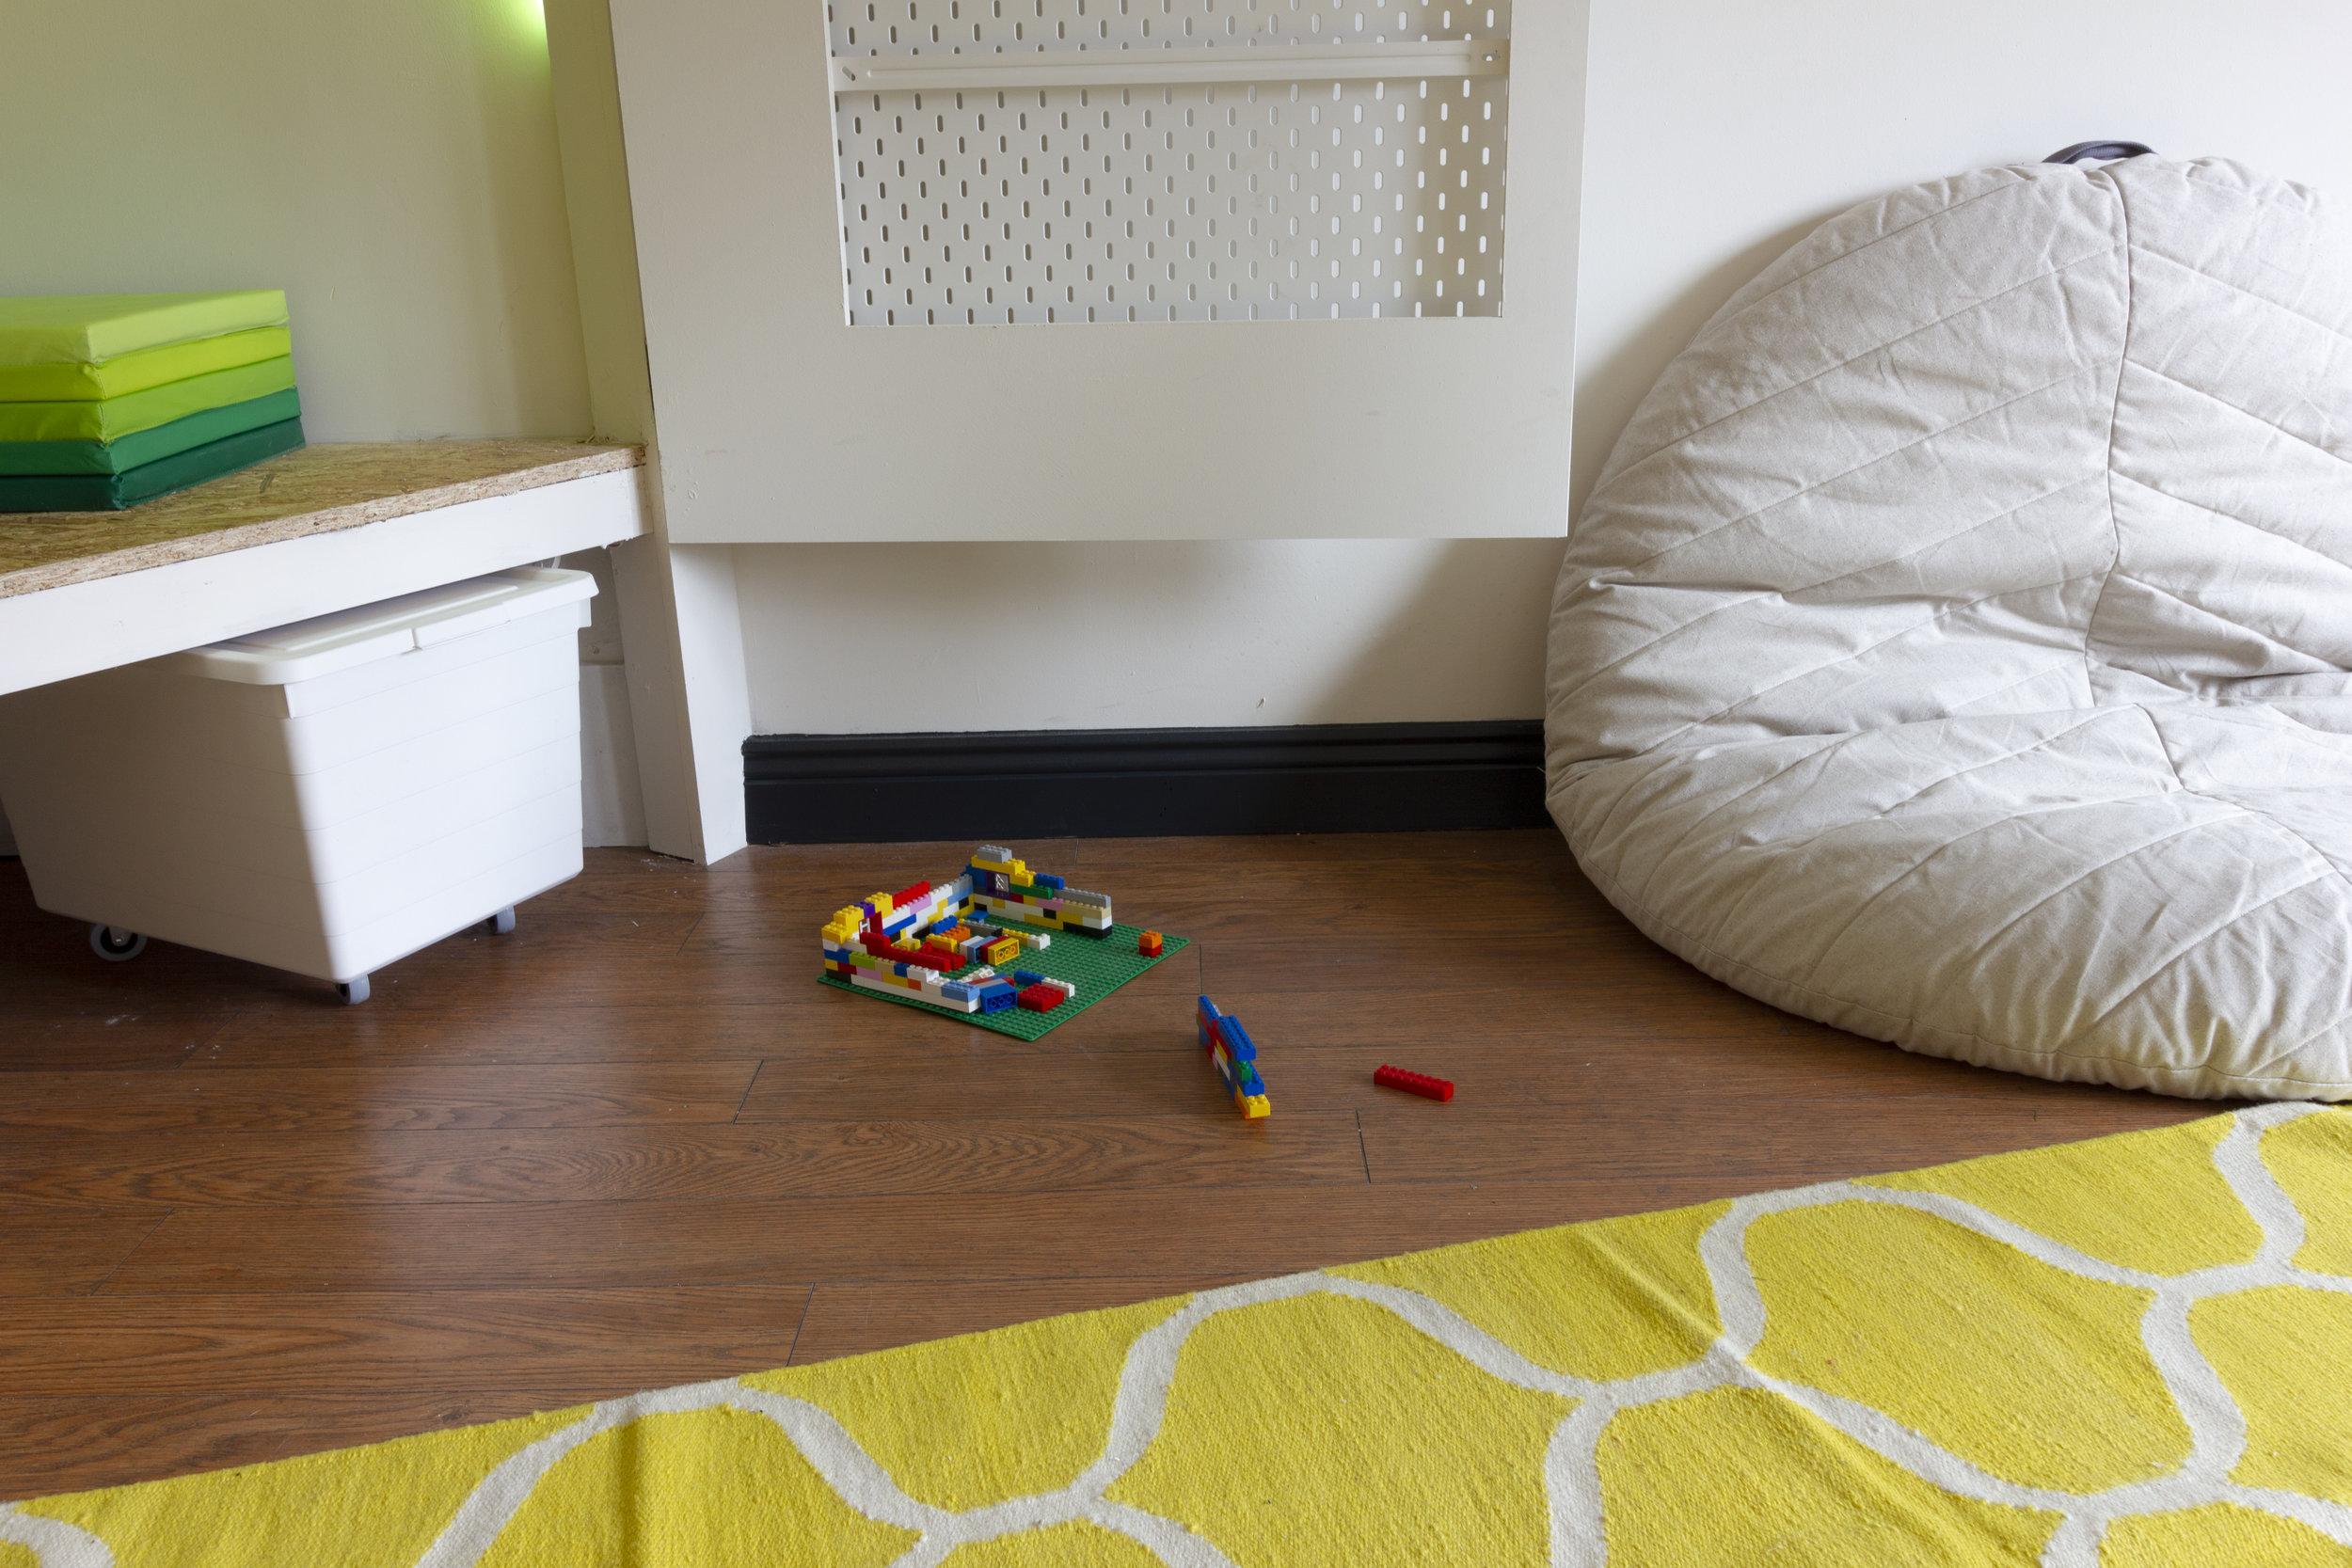 HR - The Curragh - After - Playroom 21.jpg